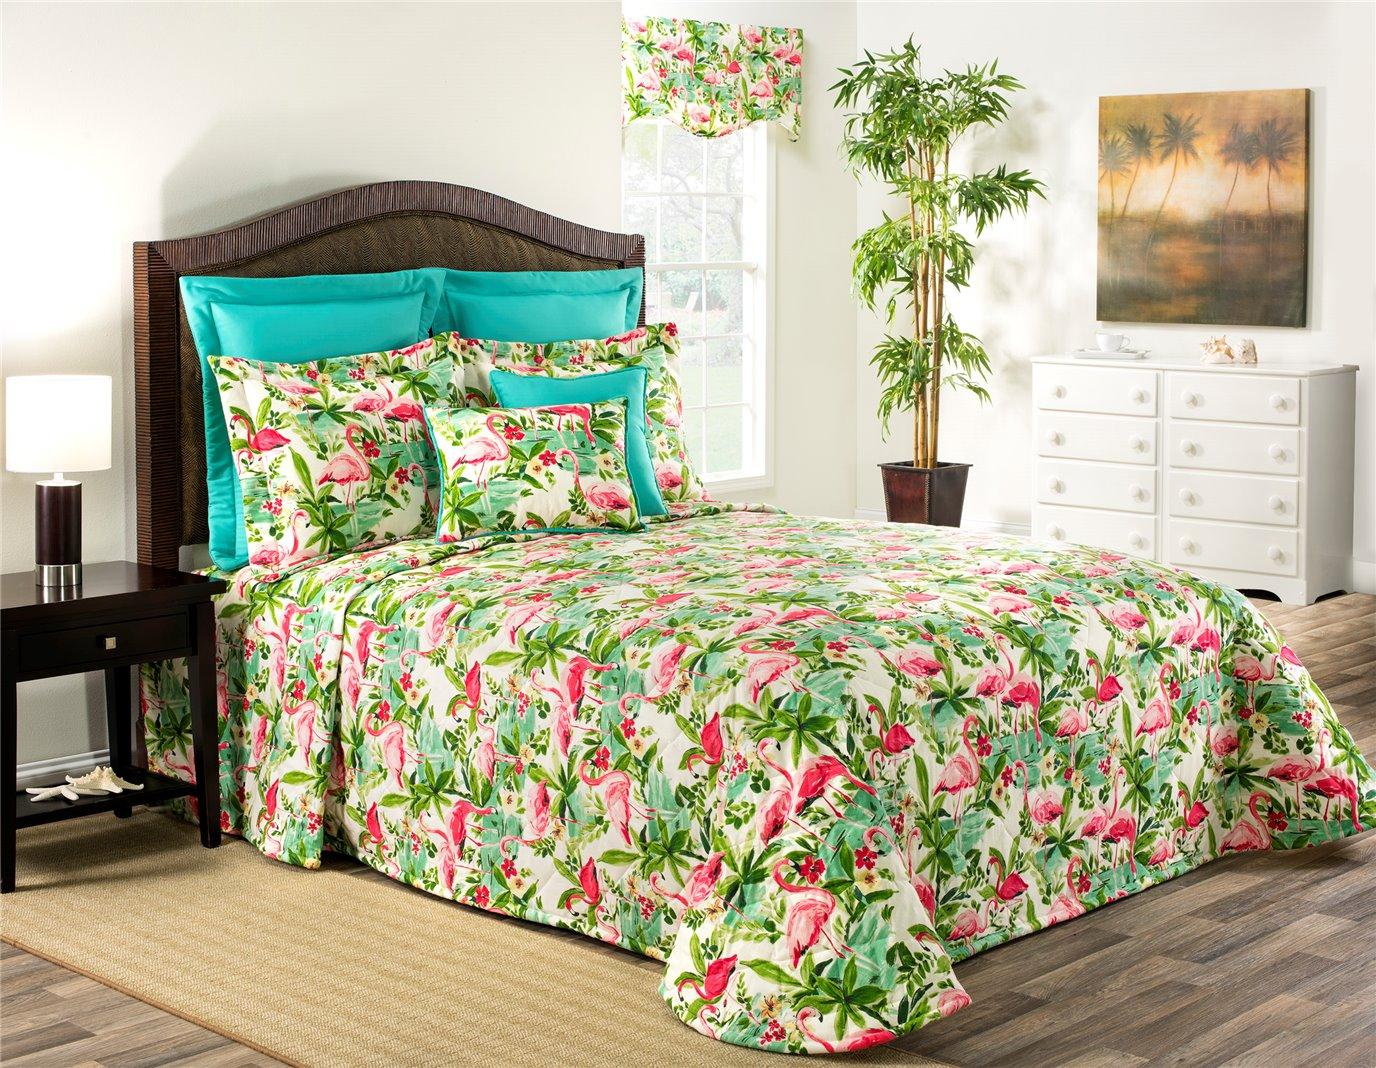 Floridian Flamingo King Bedspread